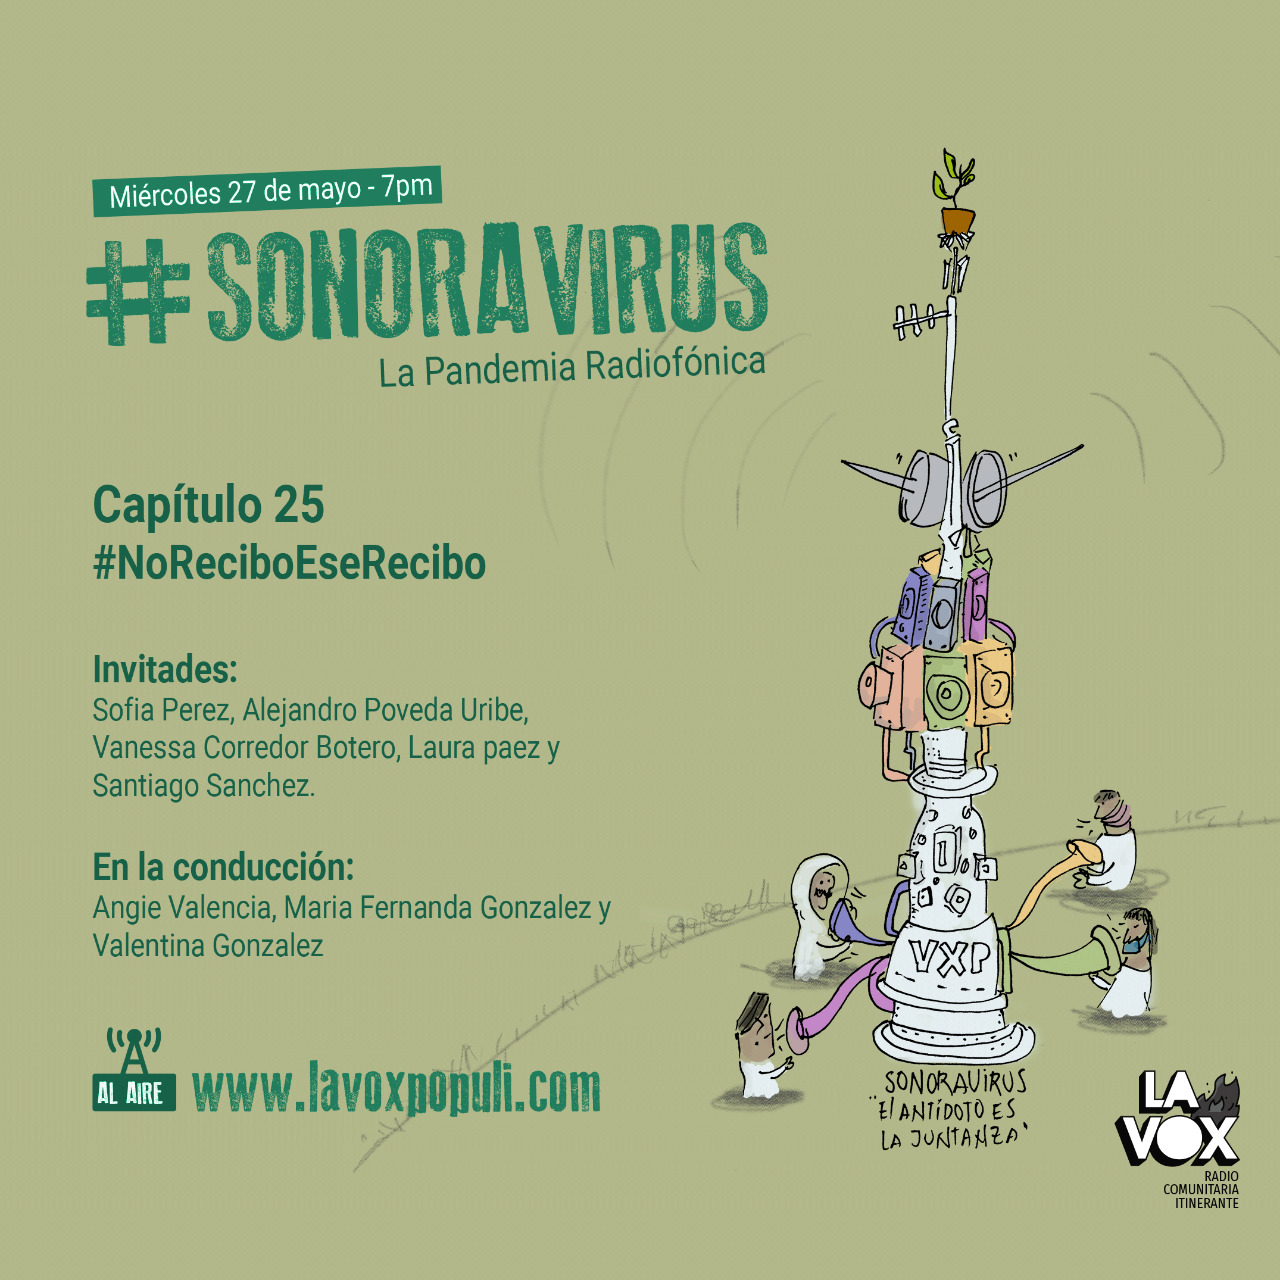 #SONORAVIRUS - La Pandemia Radiofónica. Capítulo 25: #NoReciboEseRecibo 😷